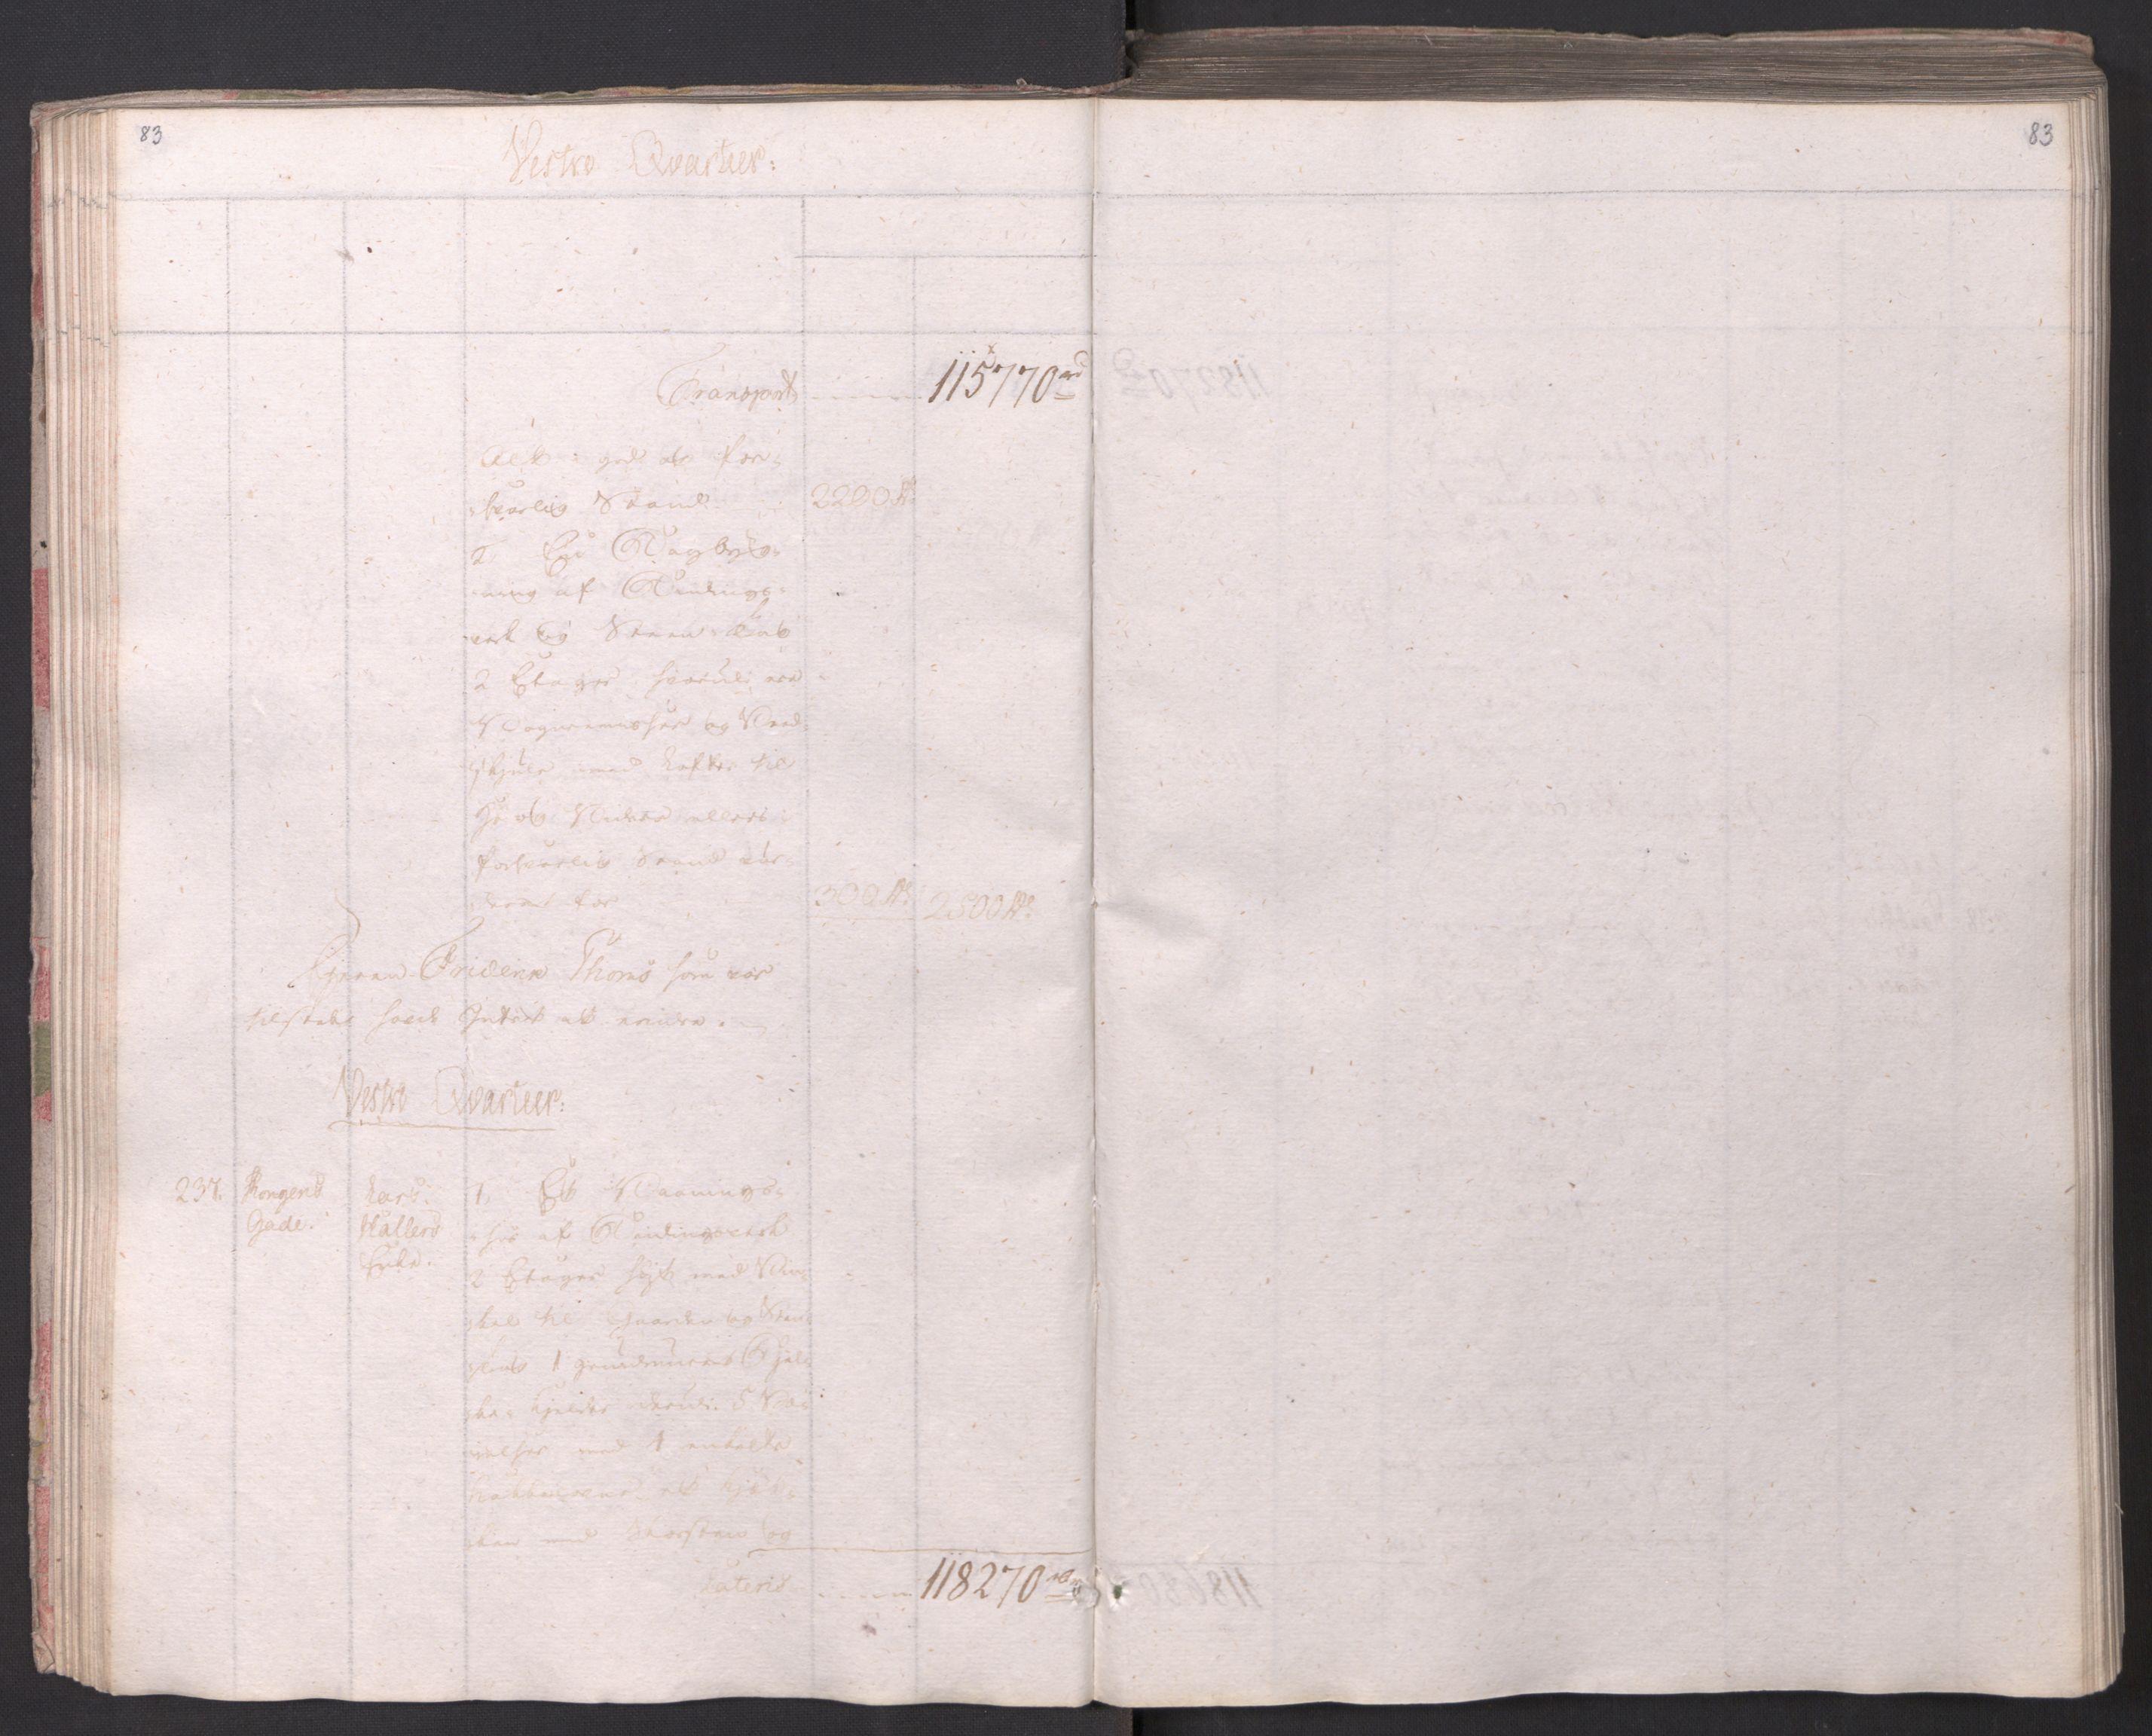 SAO, Kristiania stiftamt, I/Ia/L0015: Branntakster, 1797, s. 83